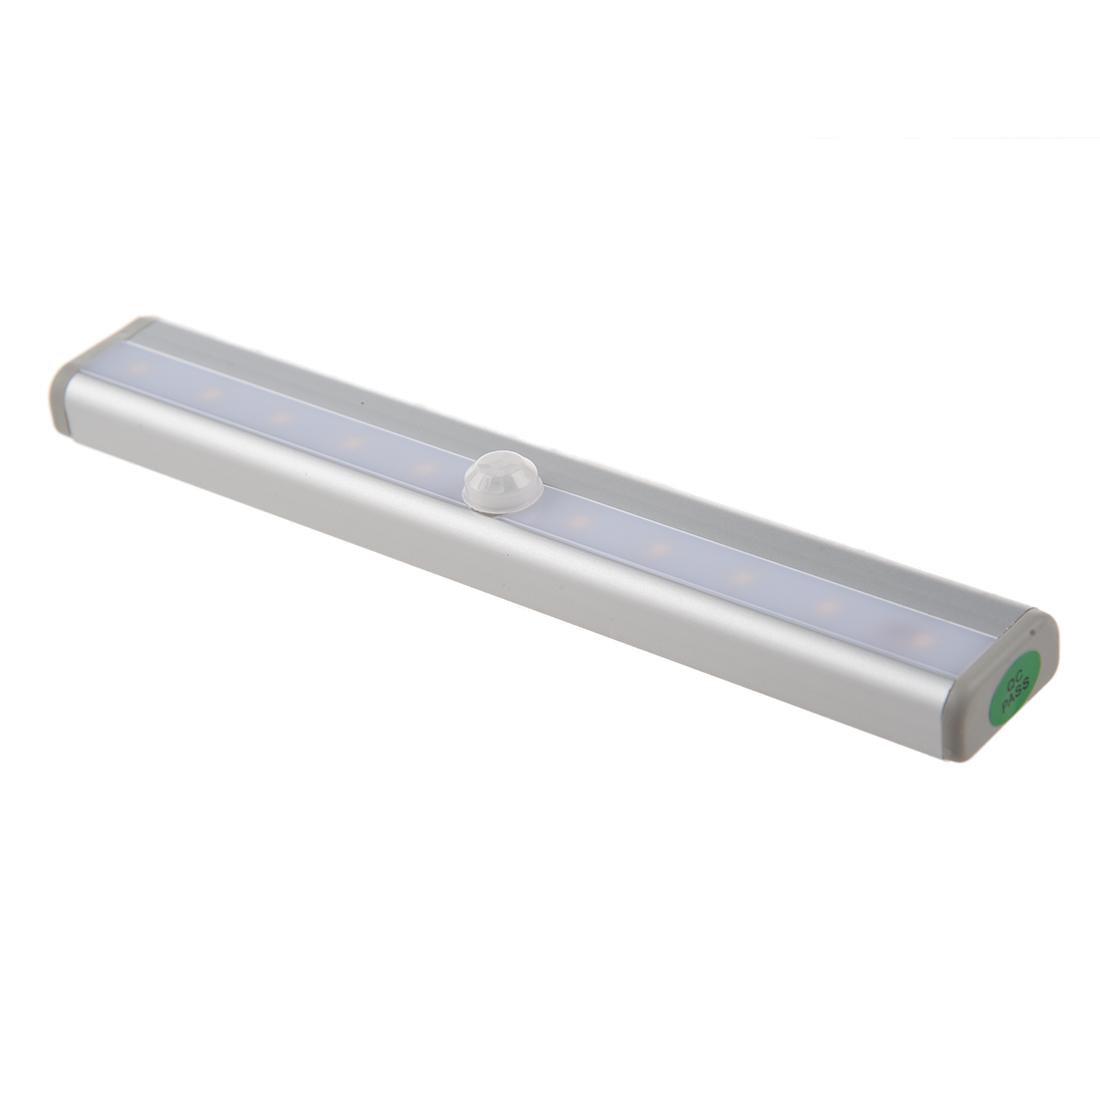 10 led pir bewegungssensor licht fuer schrank kleiderschrank